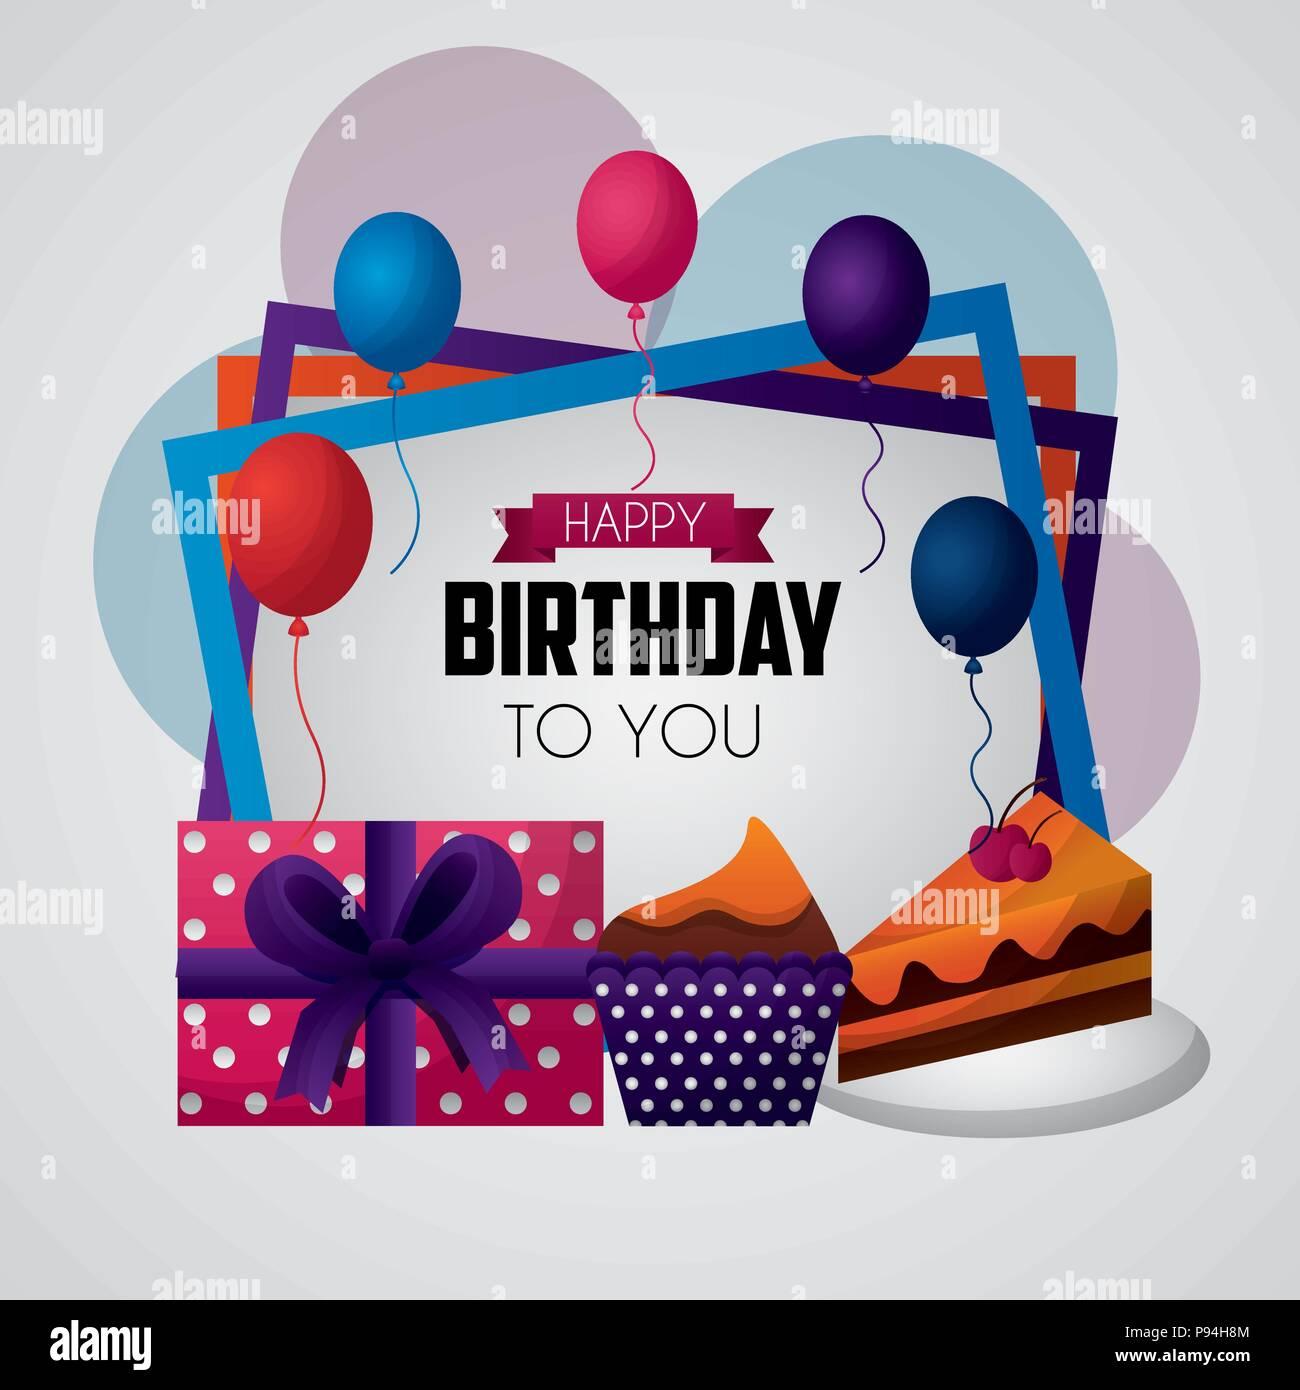 birthday card frame - Monza berglauf-verband com